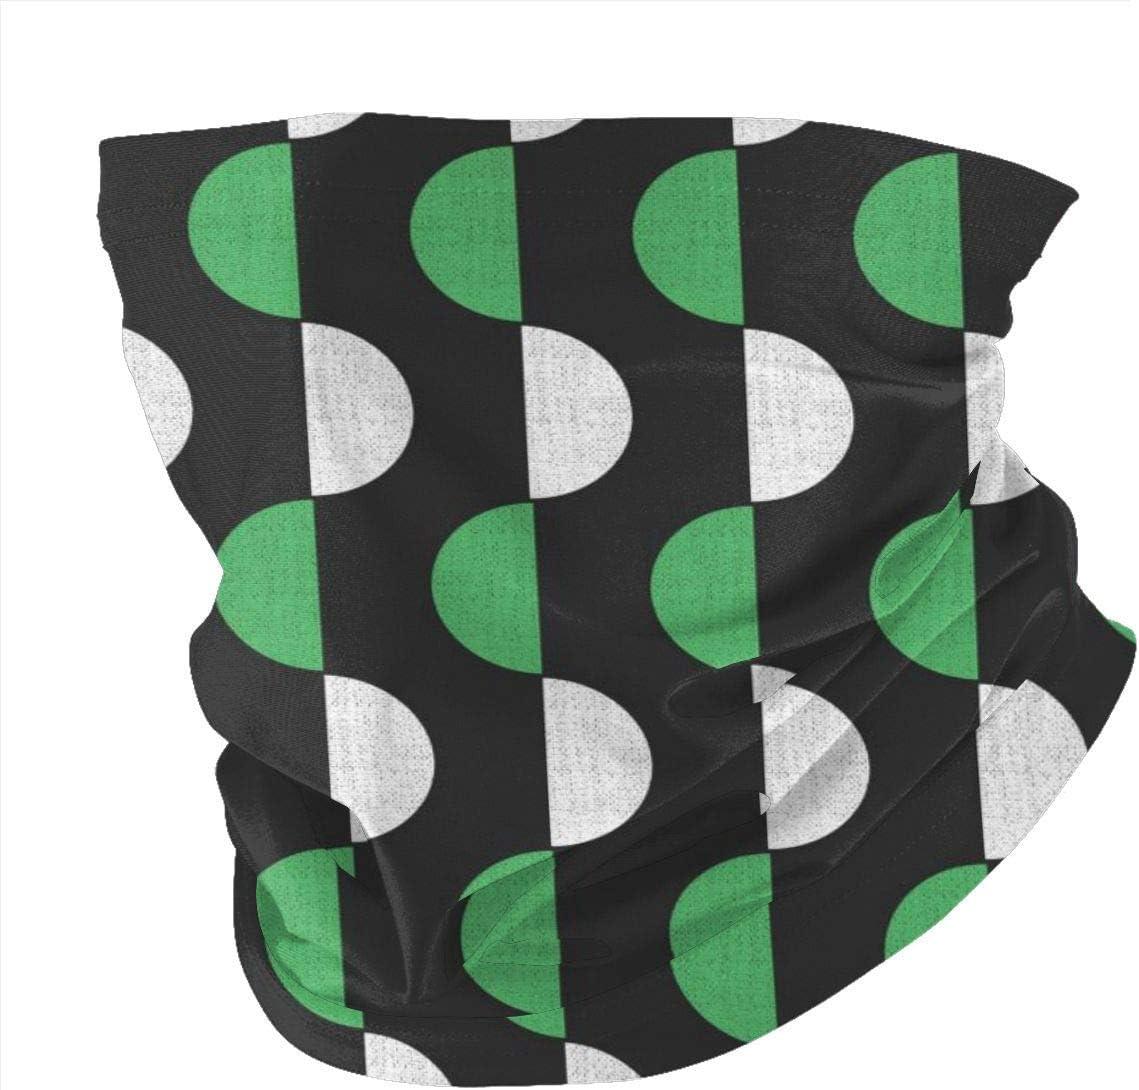 BUXI Printing Magic Headbands,Geometric Semicircle Men Women Headband,Decorative Multifunctional Headwears For Sports Fishing,25x50cm